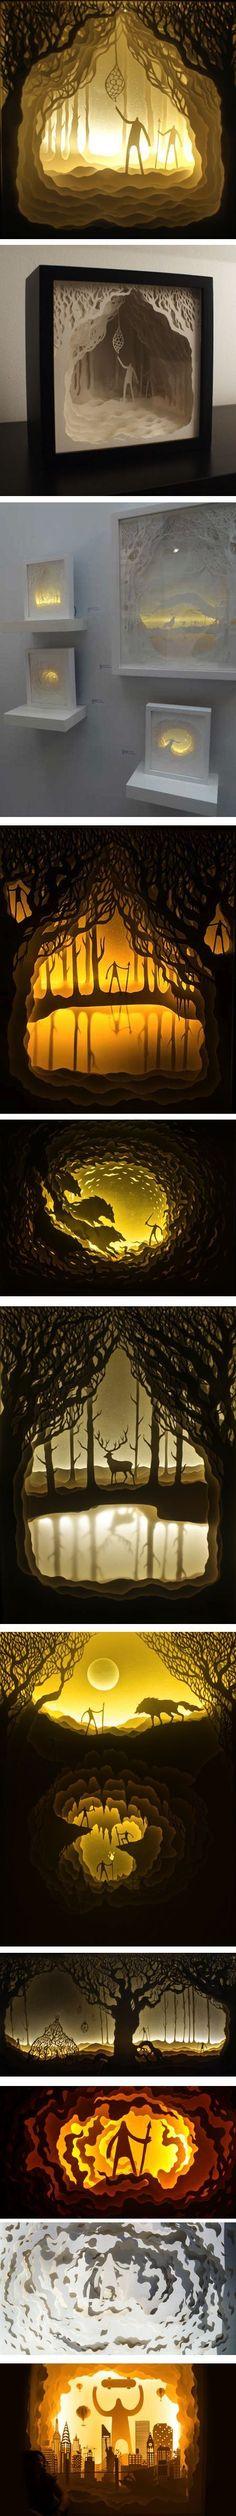 Harikrishnan Panicker and Deepti Nair create cut paper shadow boxes, illuminated with battery powered lights.